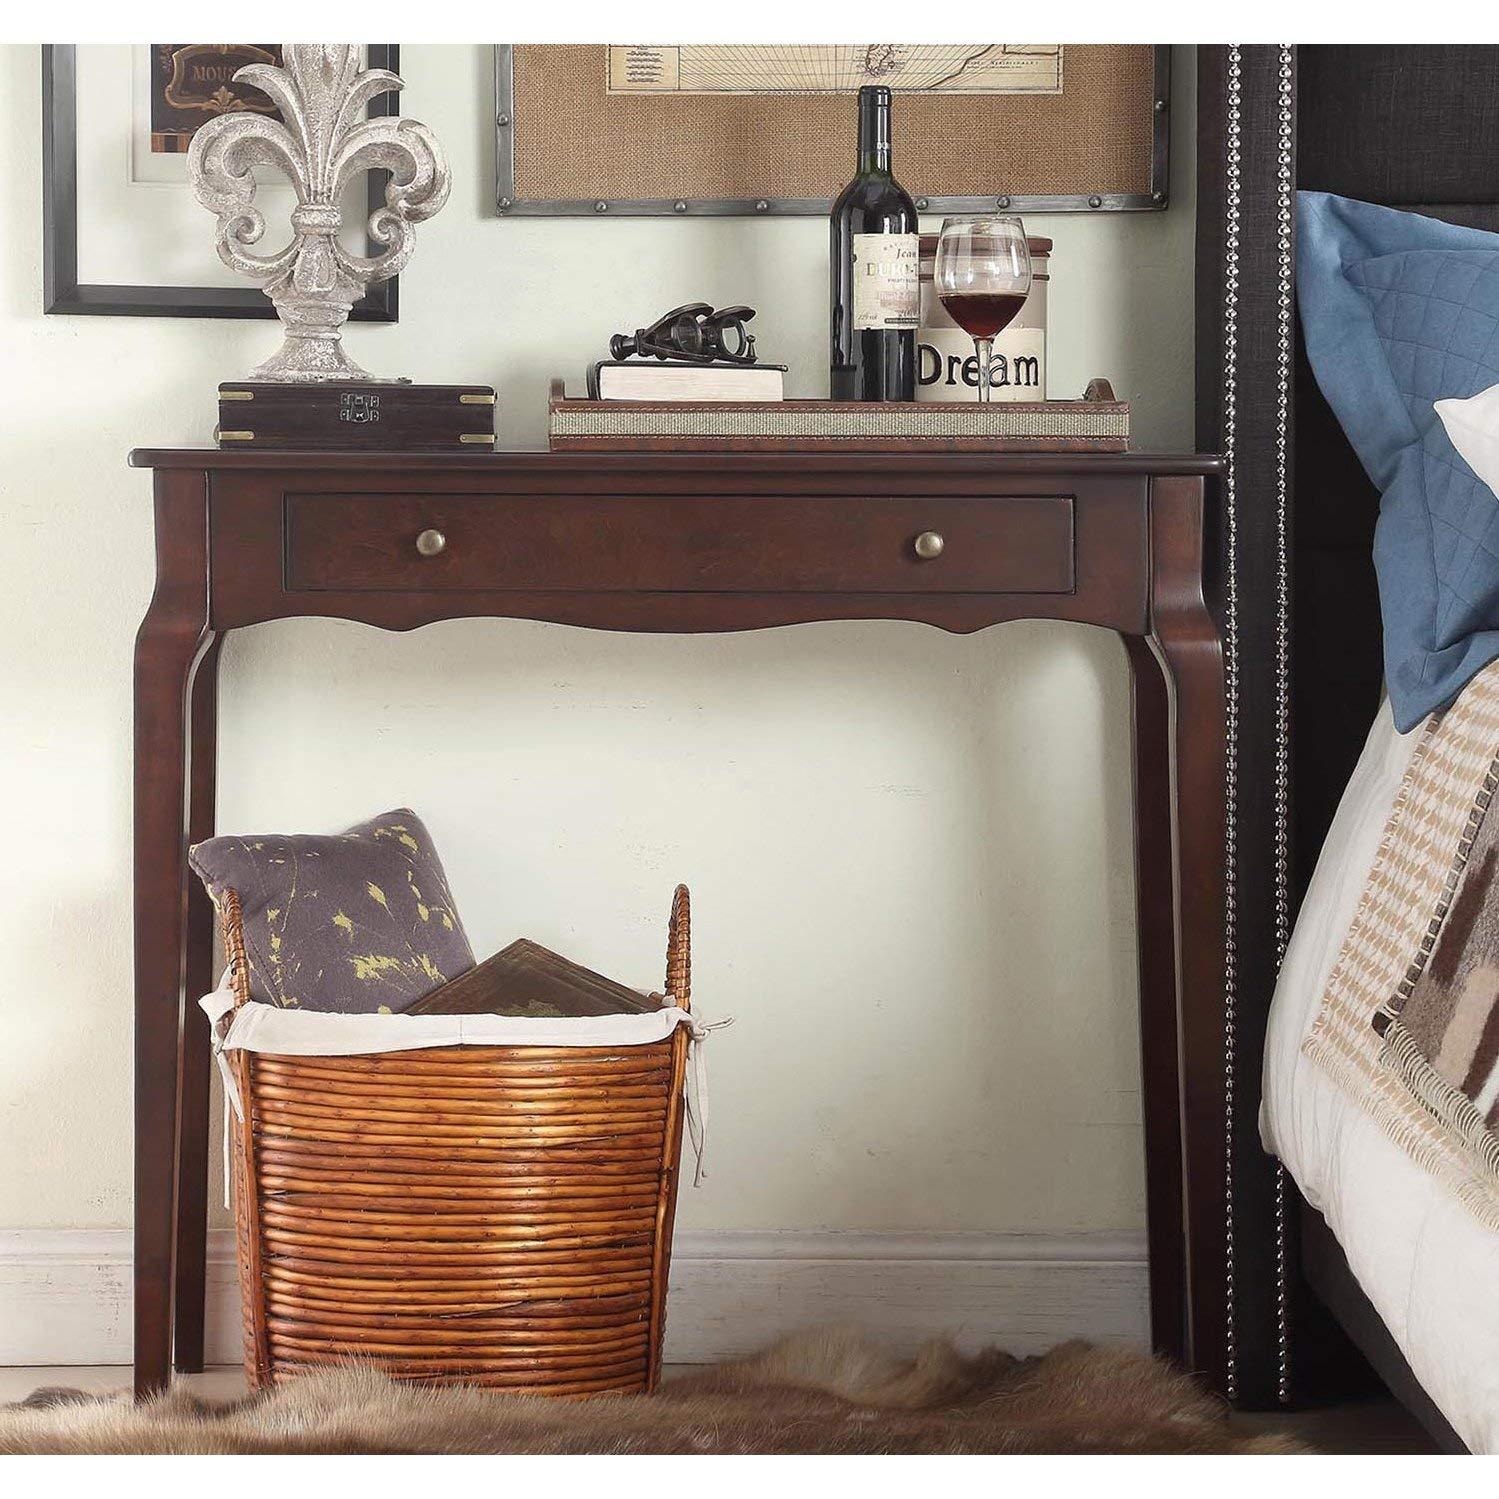 Casual Daniella 1-Drawer Wood Accent Console Sofa Table Beautiful Scalloped Apron and Curved Shape Wood Finish (Espresso)